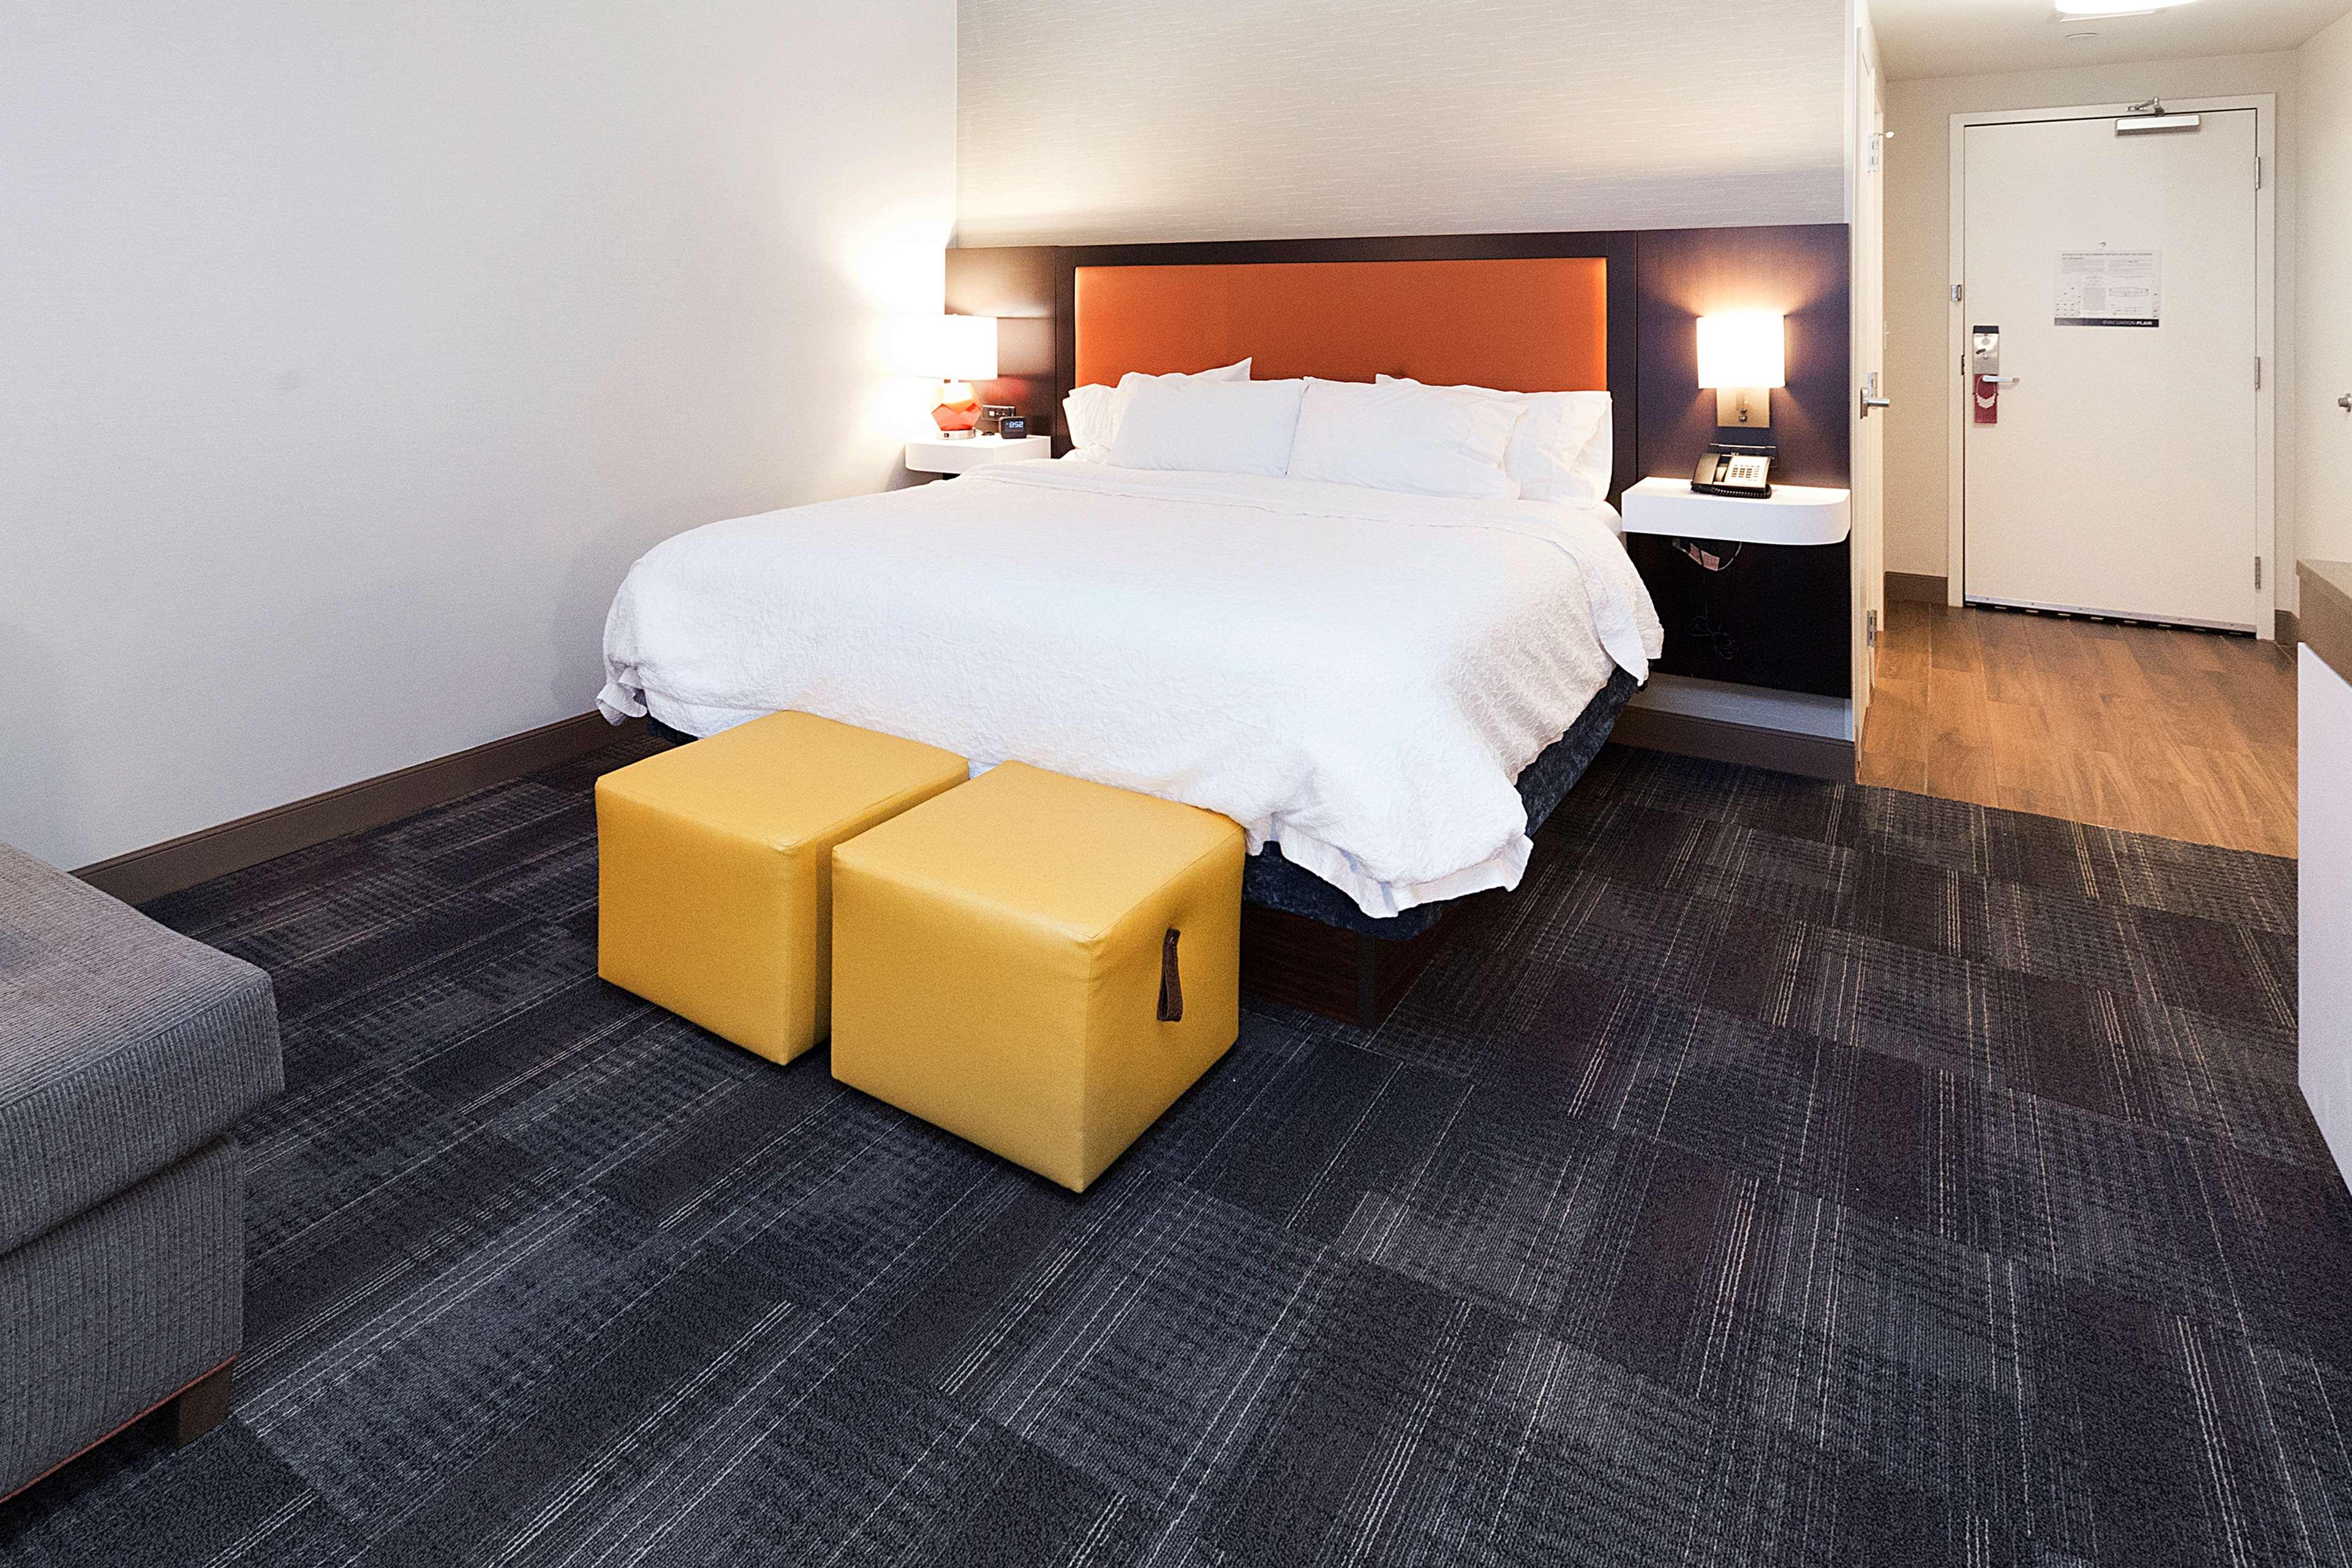 Hampton Inn & Suites Morgantown / University Town Centre image 17